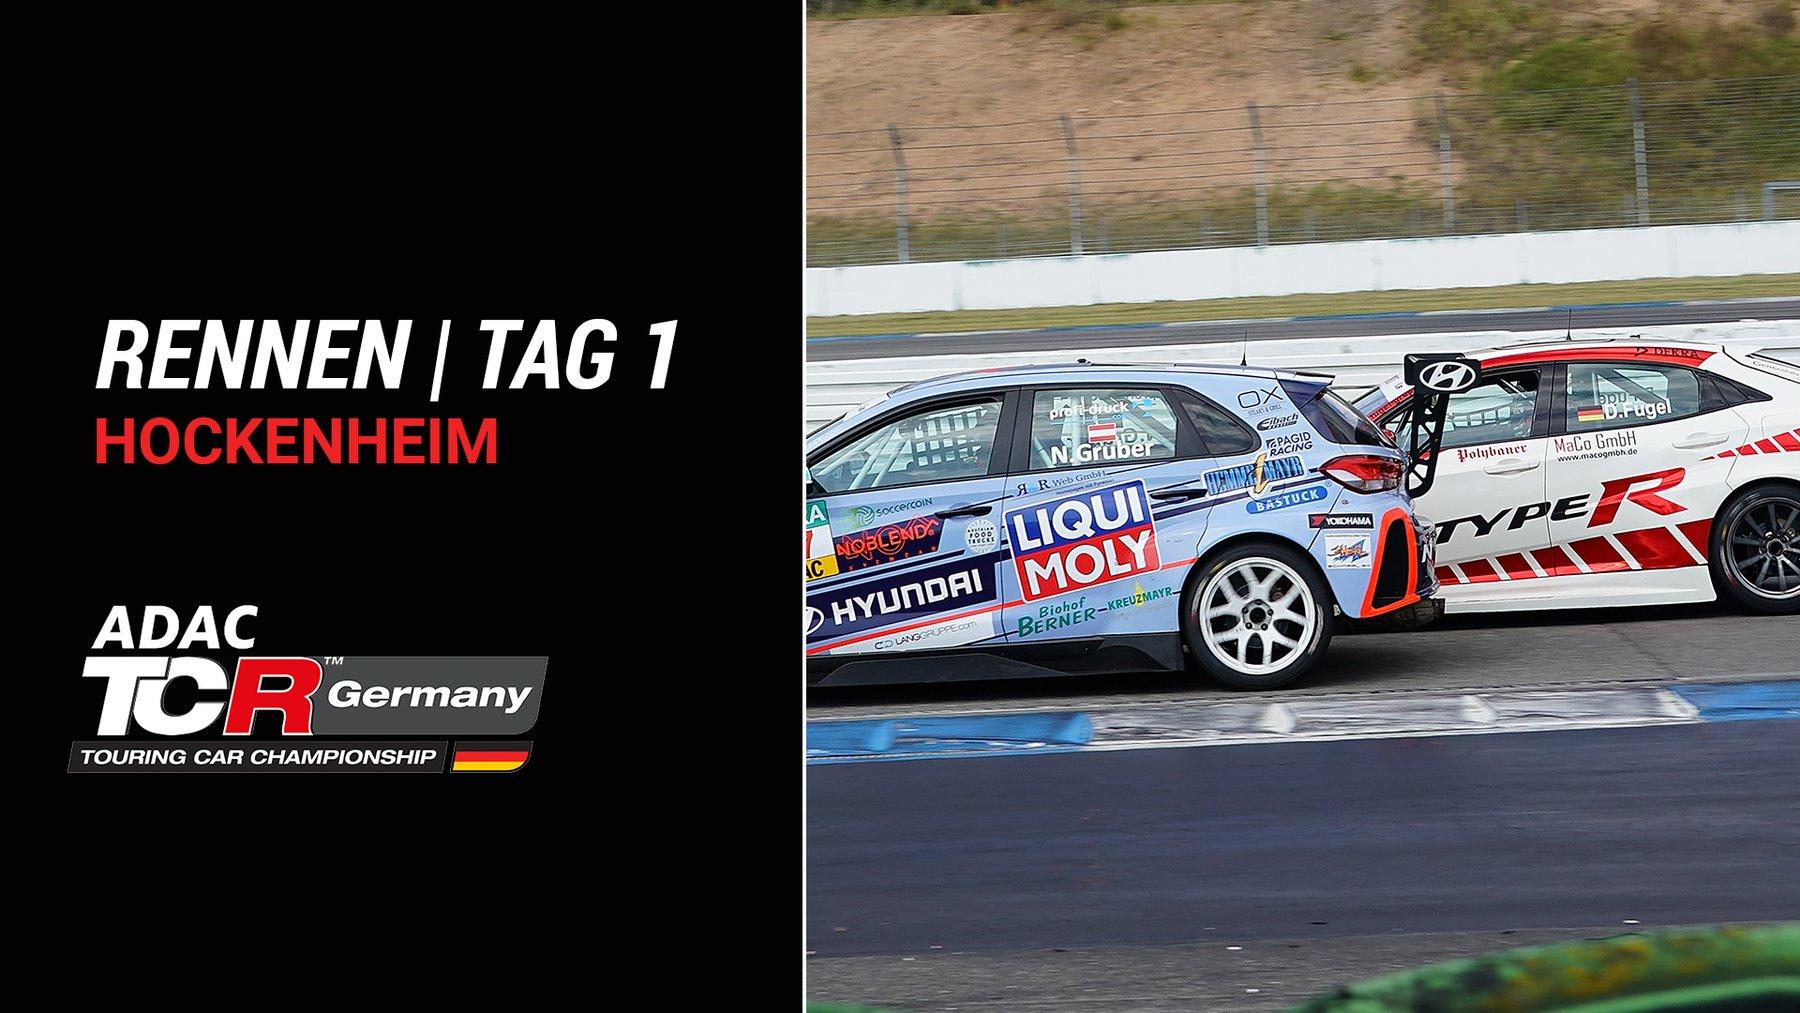 TCR Germany - Rennen 1